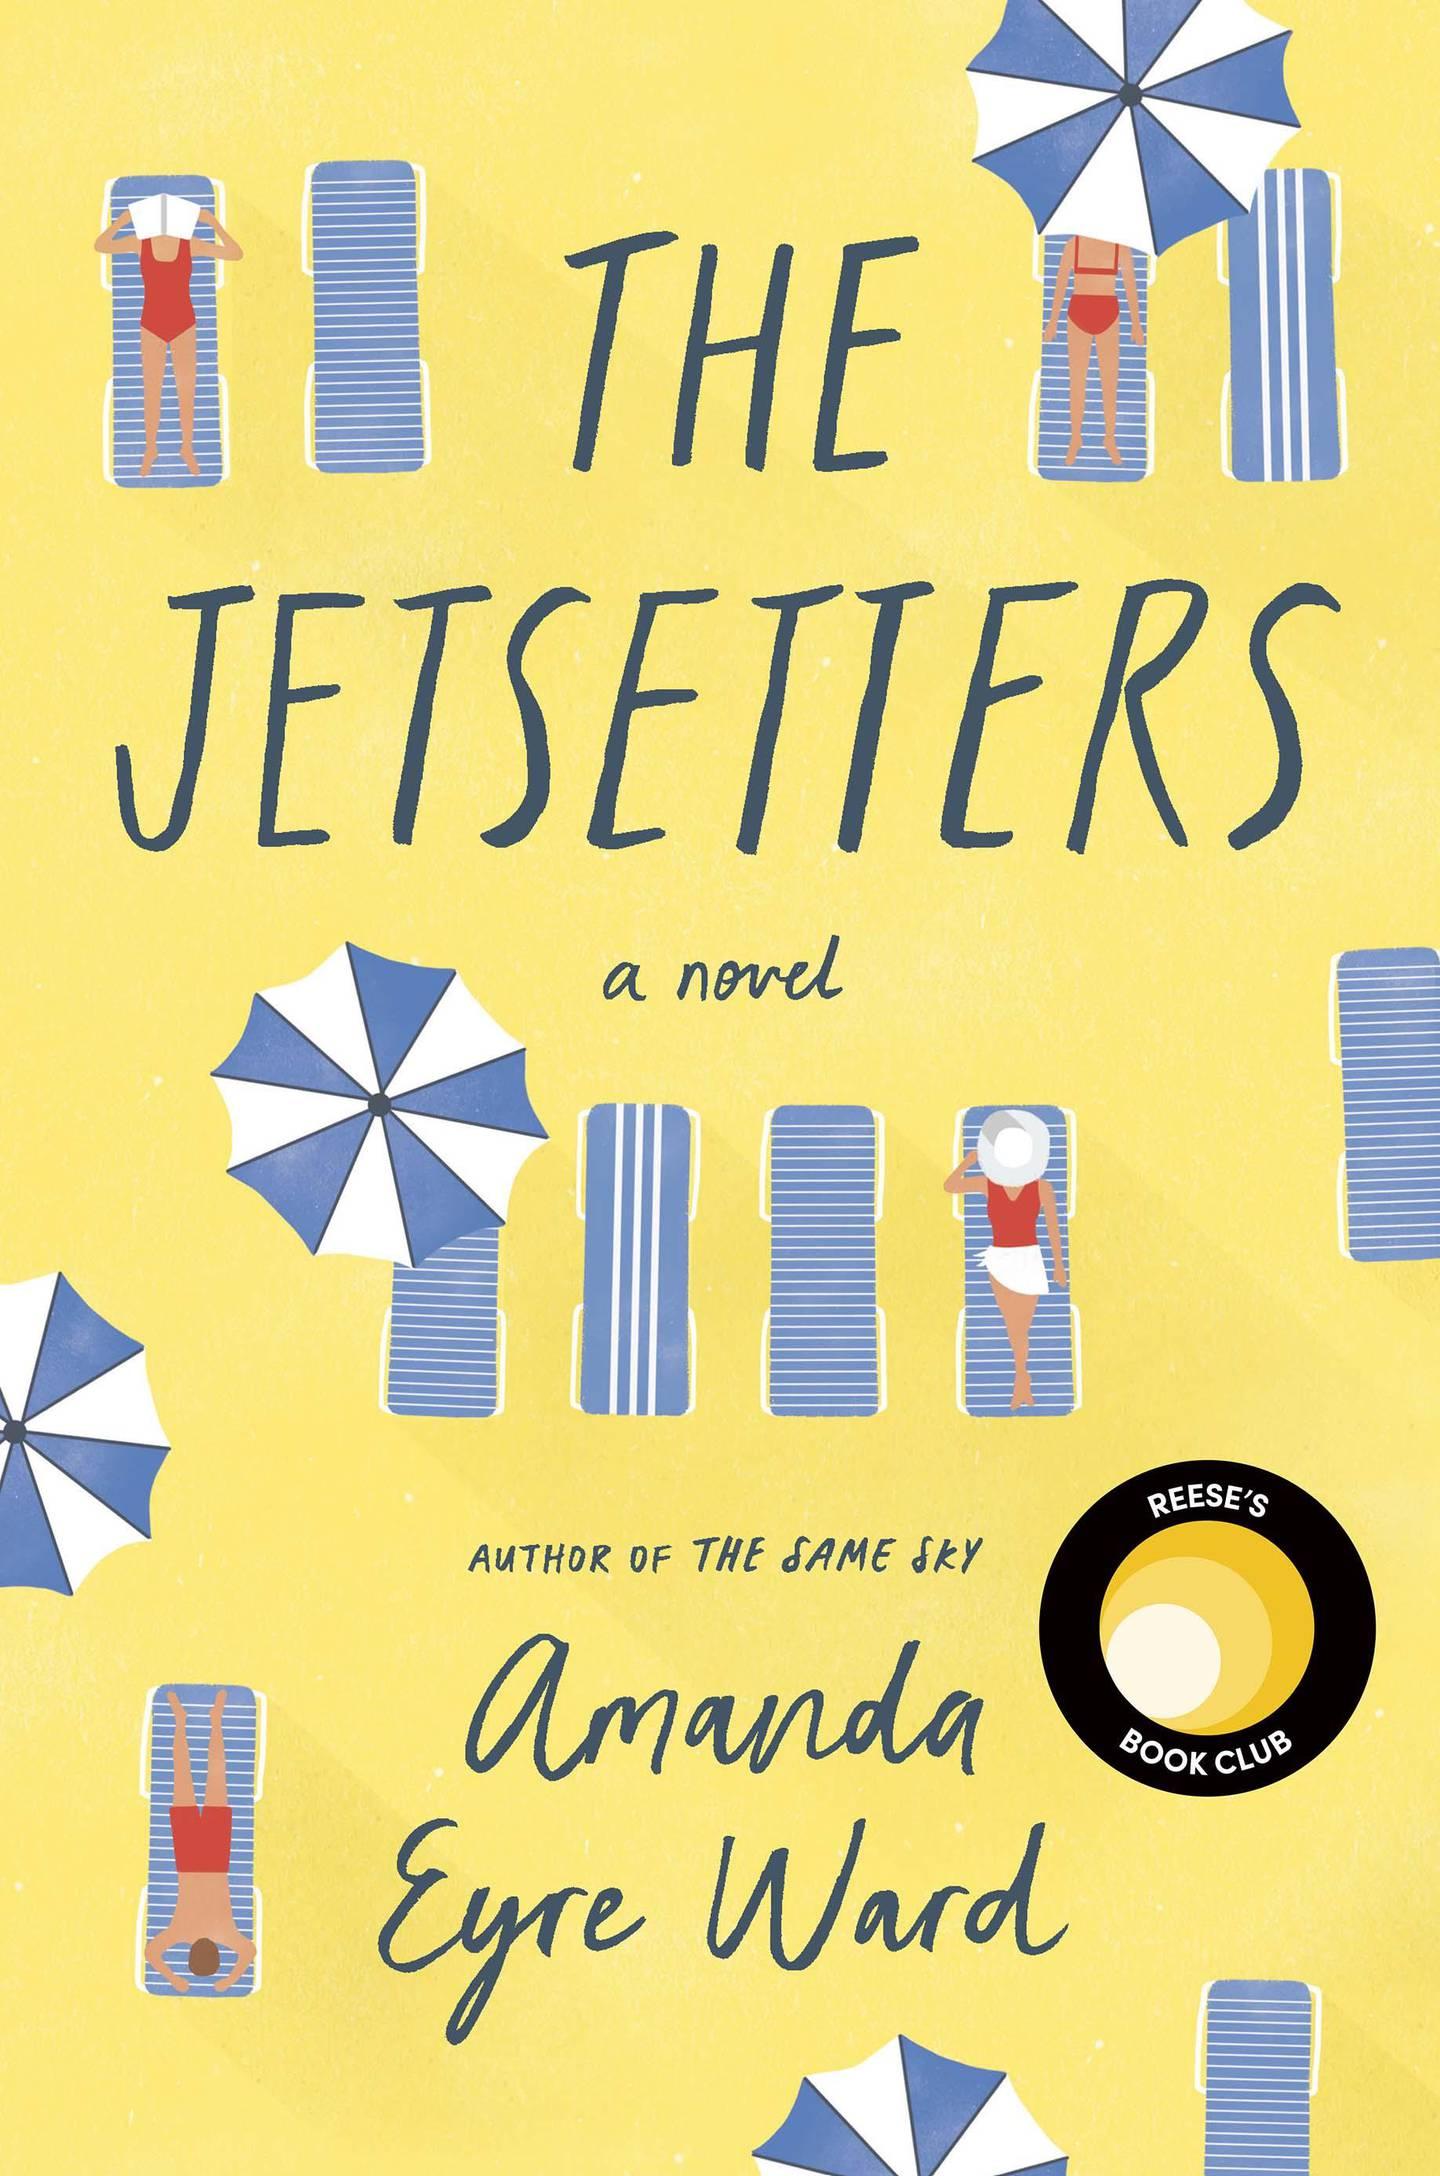 The Jetsetters: A Novel by Amanda Eyre Ward. Courtesy Penguin Random House